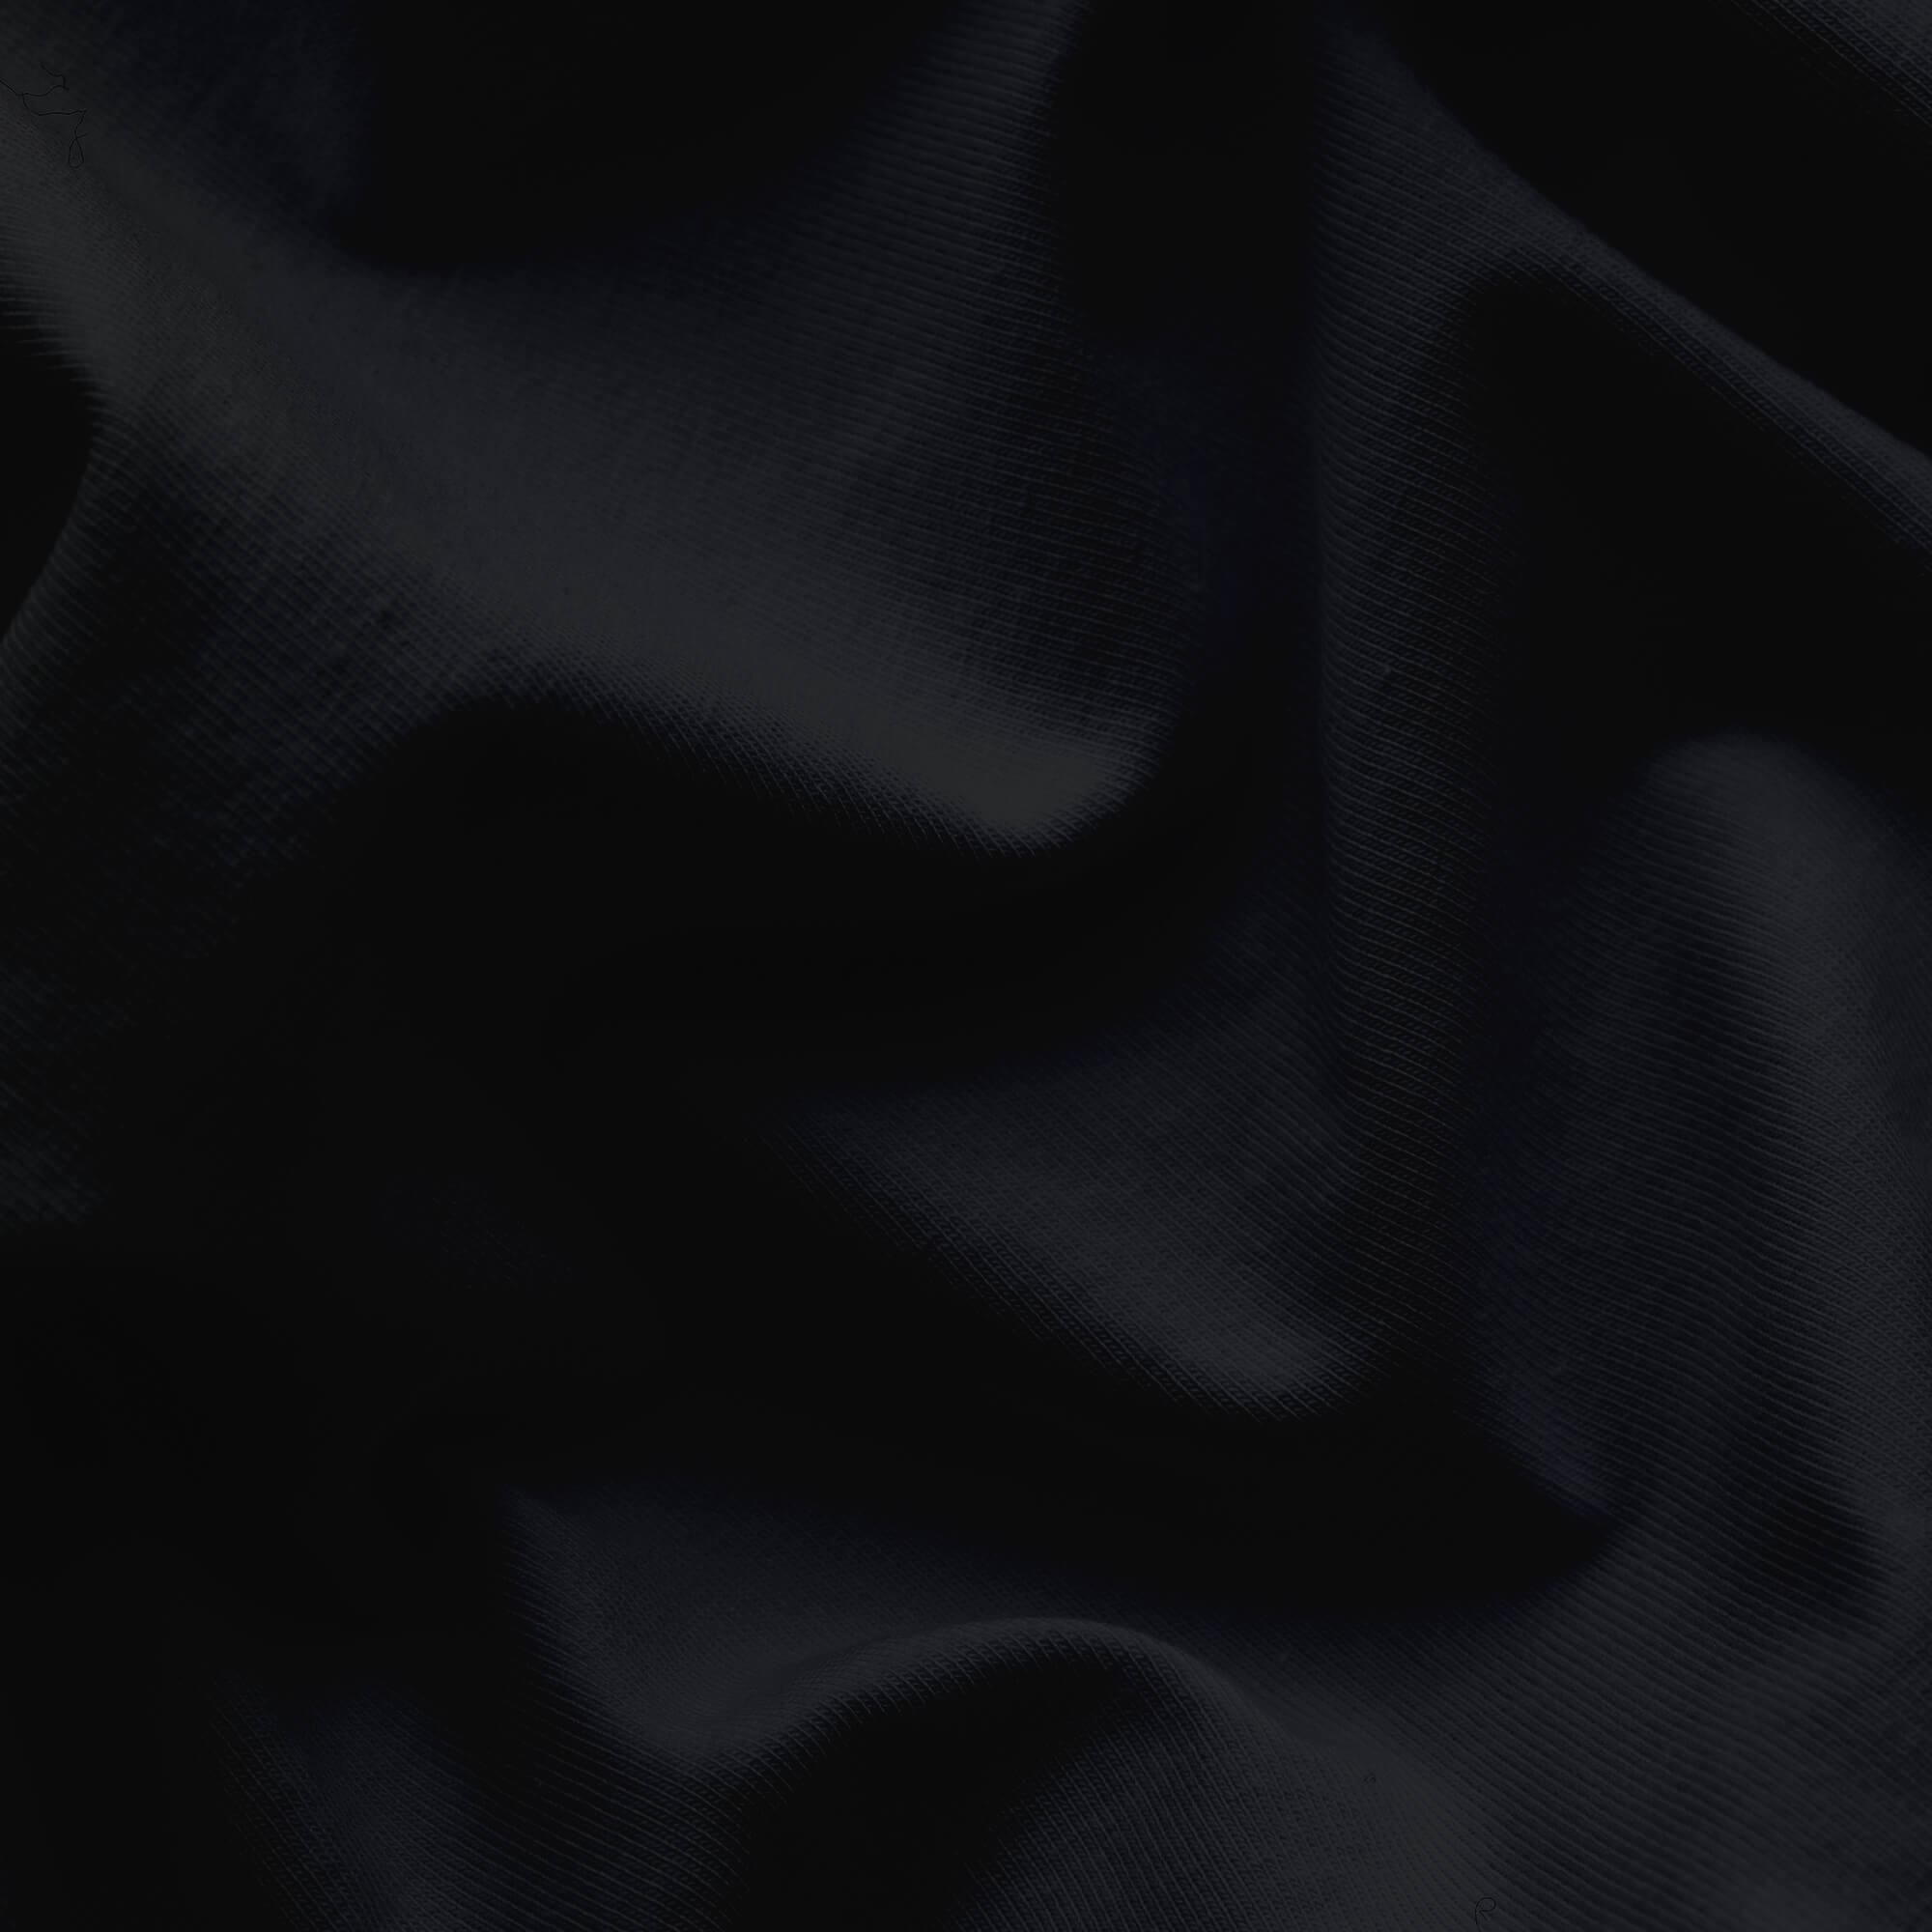 schwarzes schlafgut Spannbettlaken Topper Jersey Elasthan